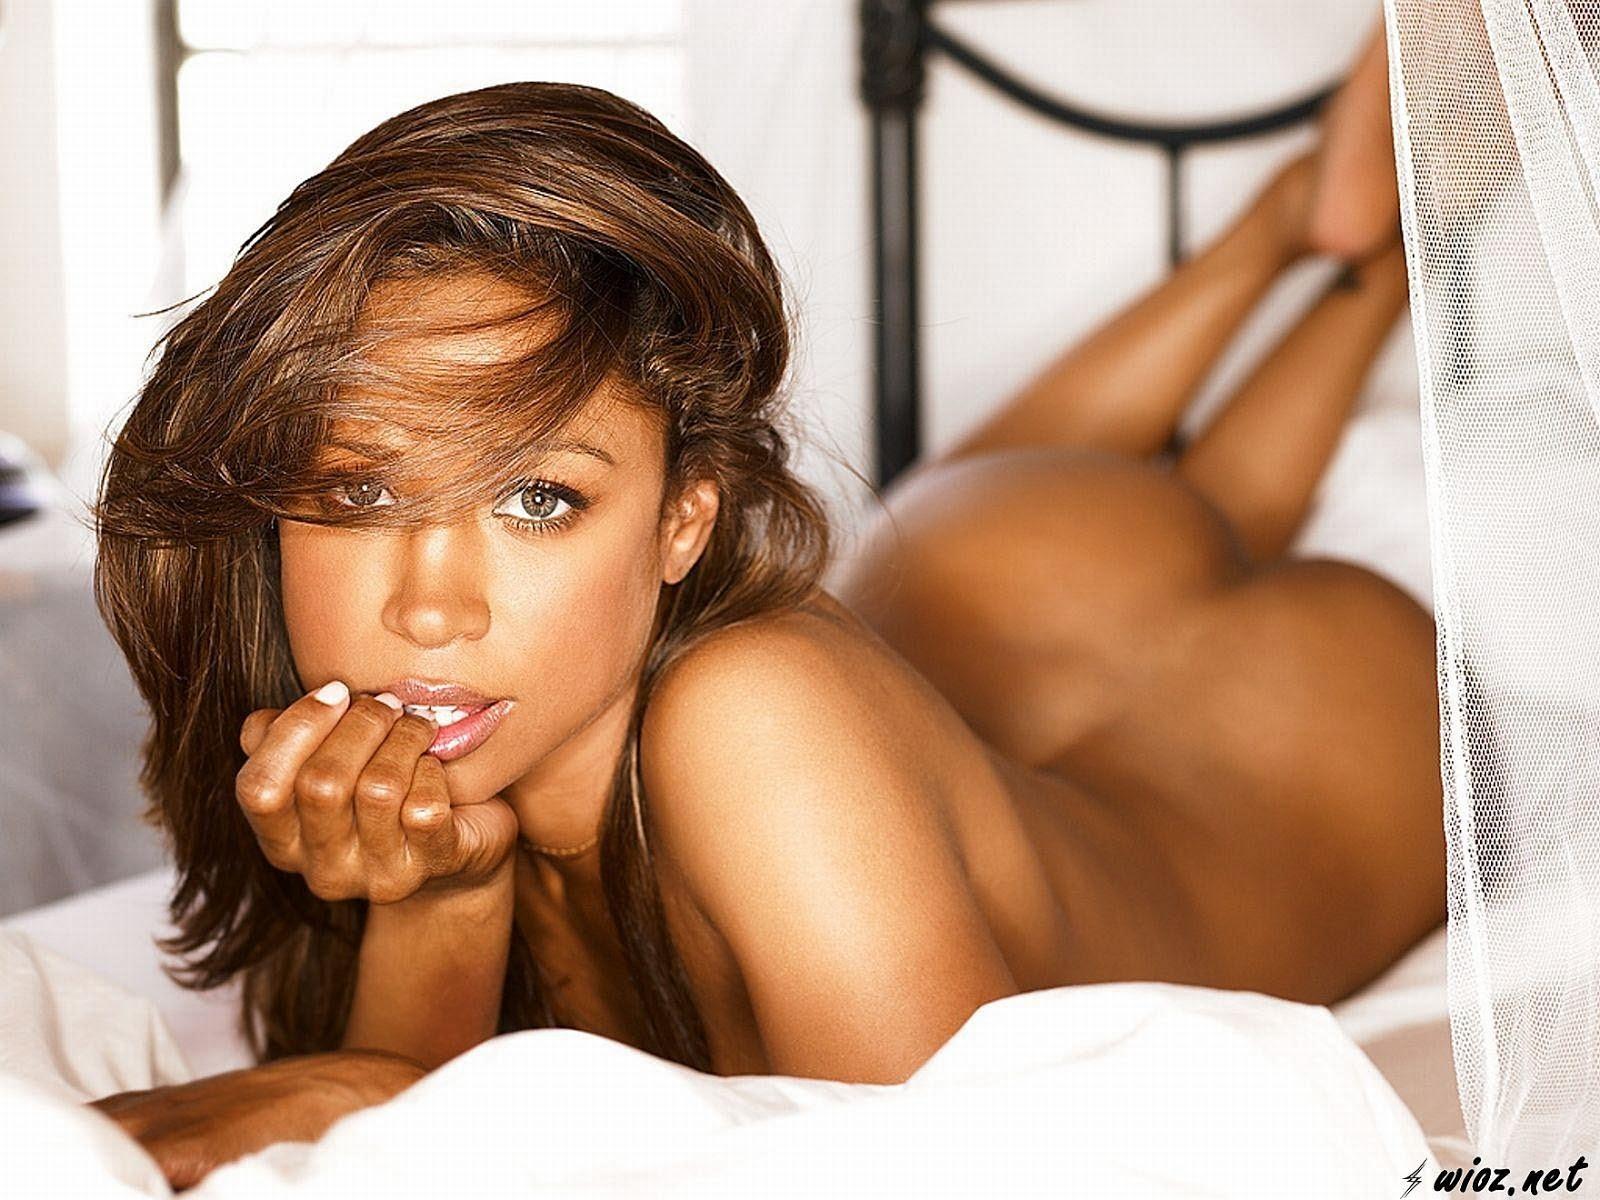 http://2.bp.blogspot.com/-Ao7sbwtIyZ4/UWV6VK_eWwI/AAAAAAAAGrM/W_LqSKlYvLc/s1600/stacey-dash-nude-hot-single-ladies-vh1-hq-hd.jpg